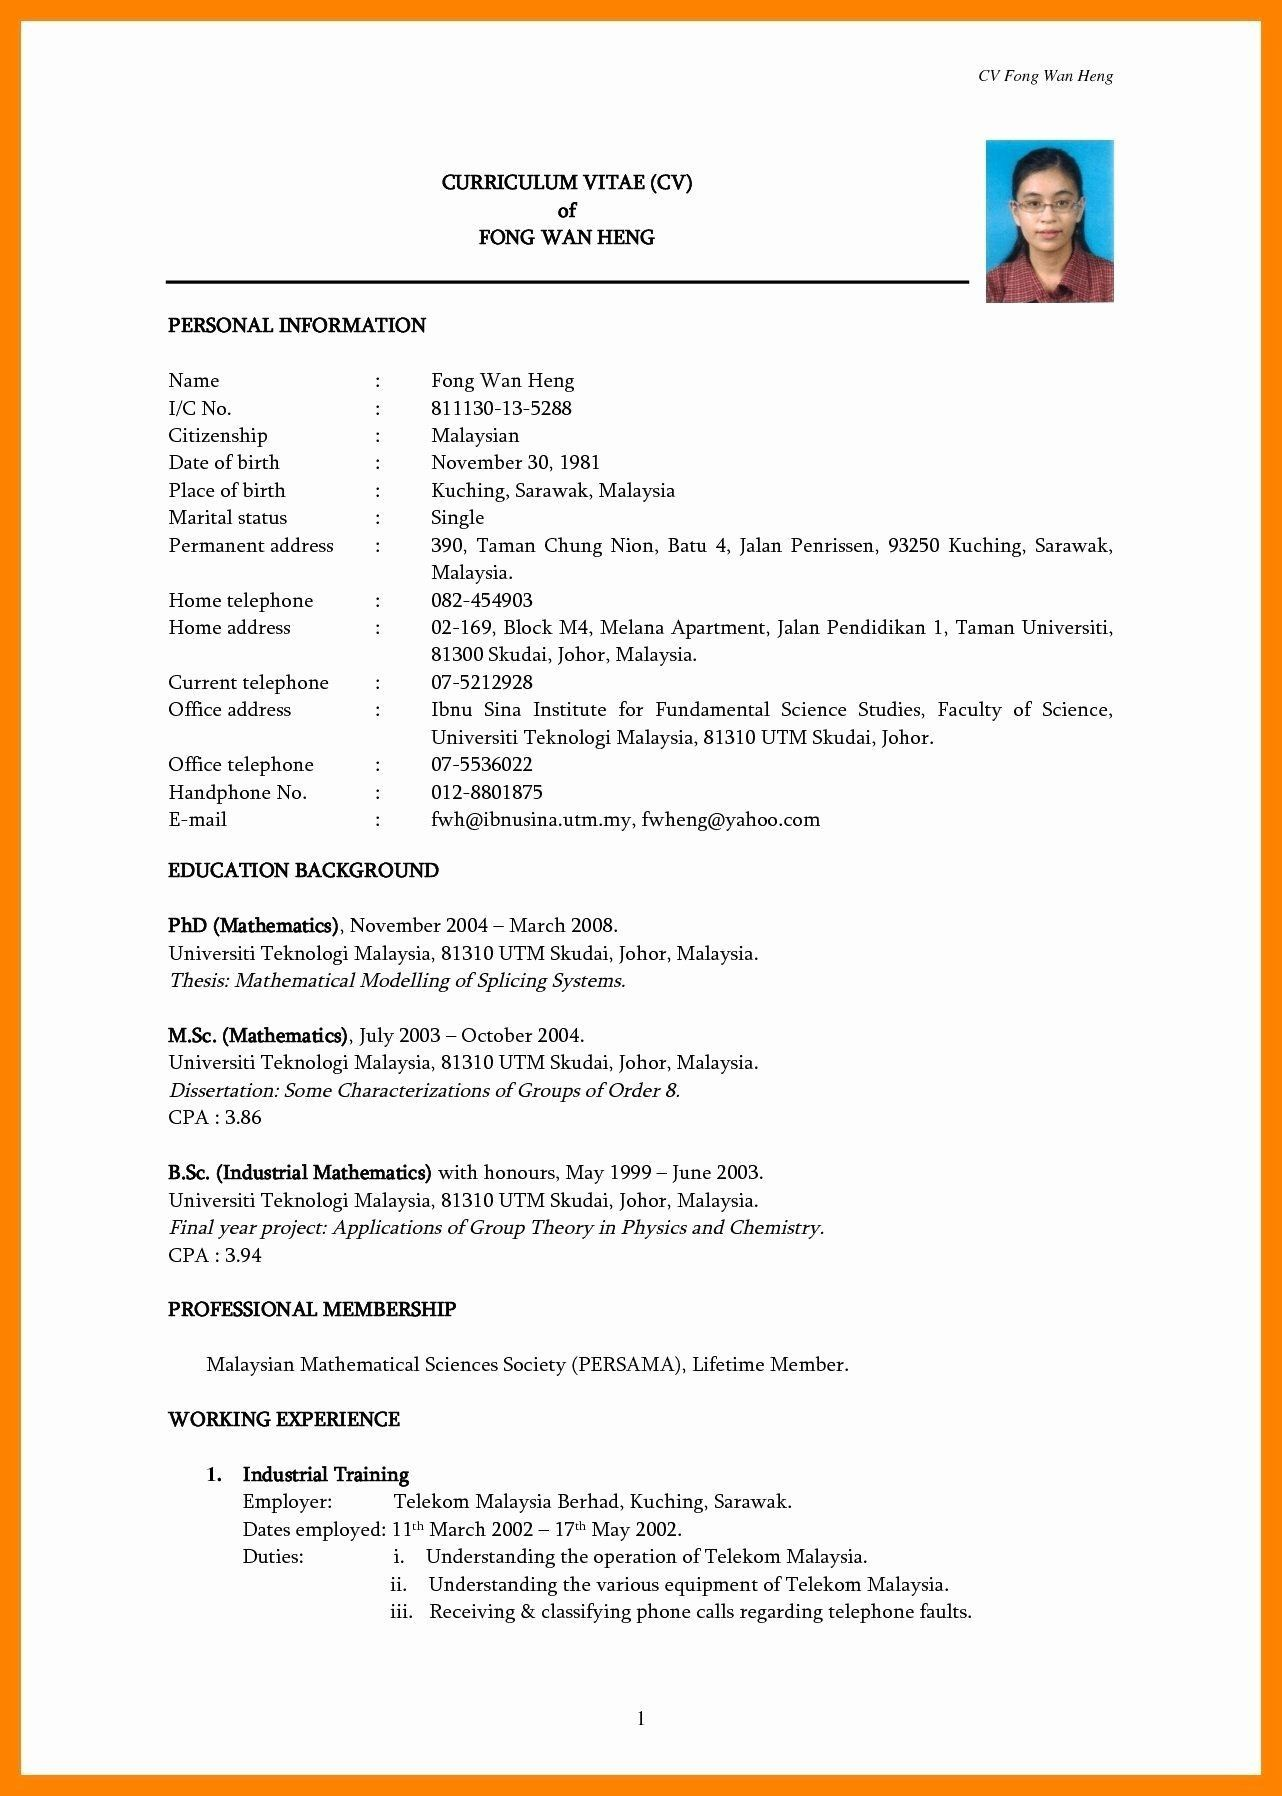 003 Breathtaking Free Basic Resume Template Download Idea  M Word Quora For Microsoft 2010Full